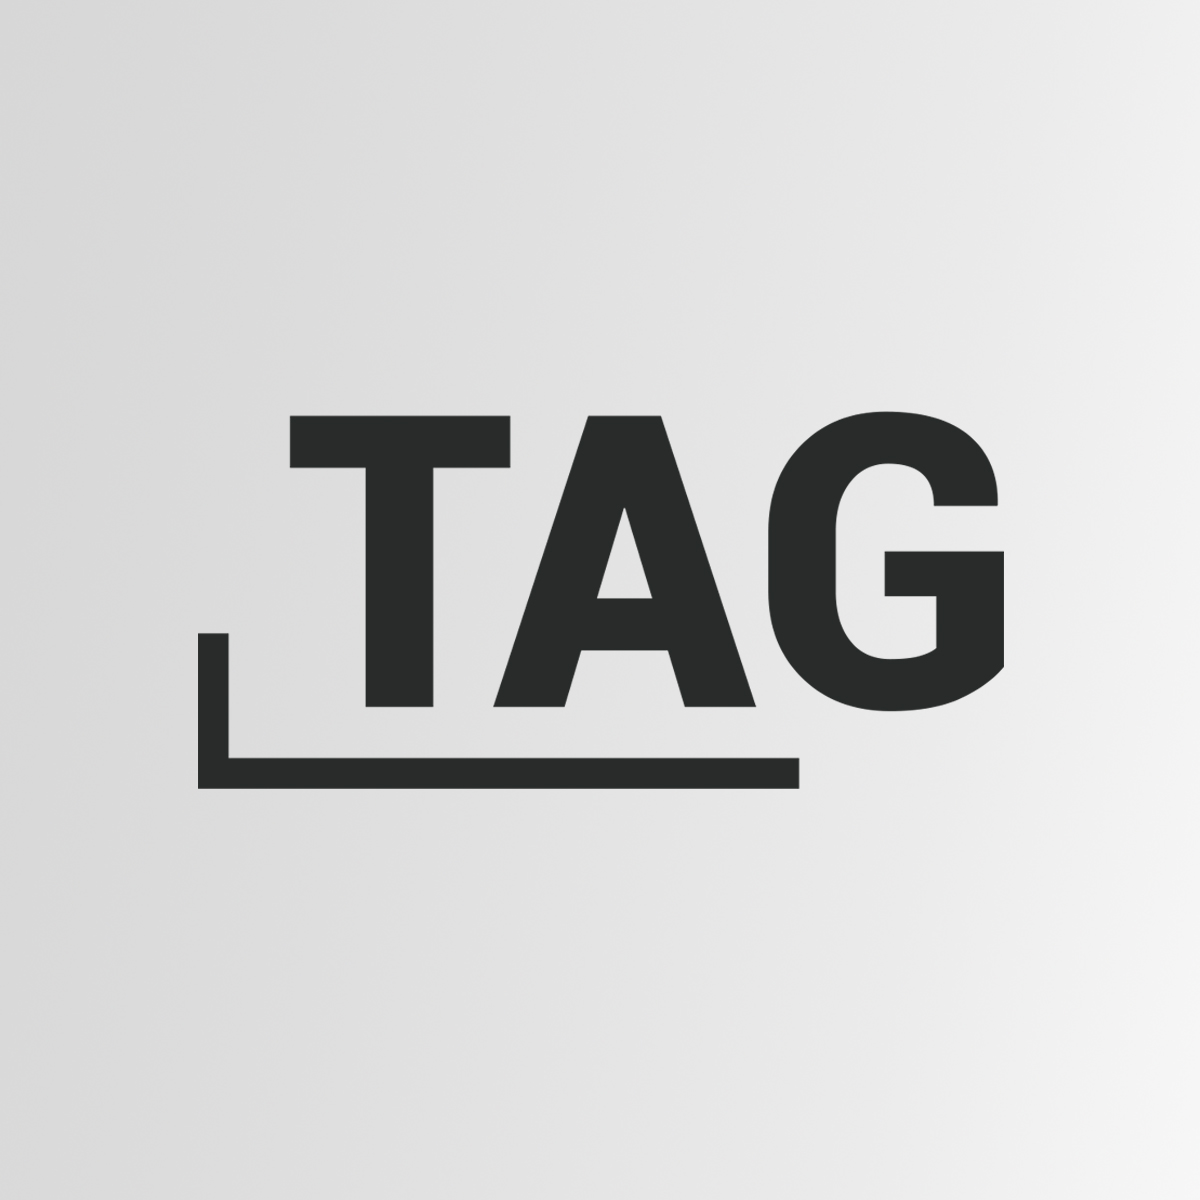 branding - creative-agency-logo design-community-marketing-web design-social media-business cards-thompsons ad group-print design-flyer distribution